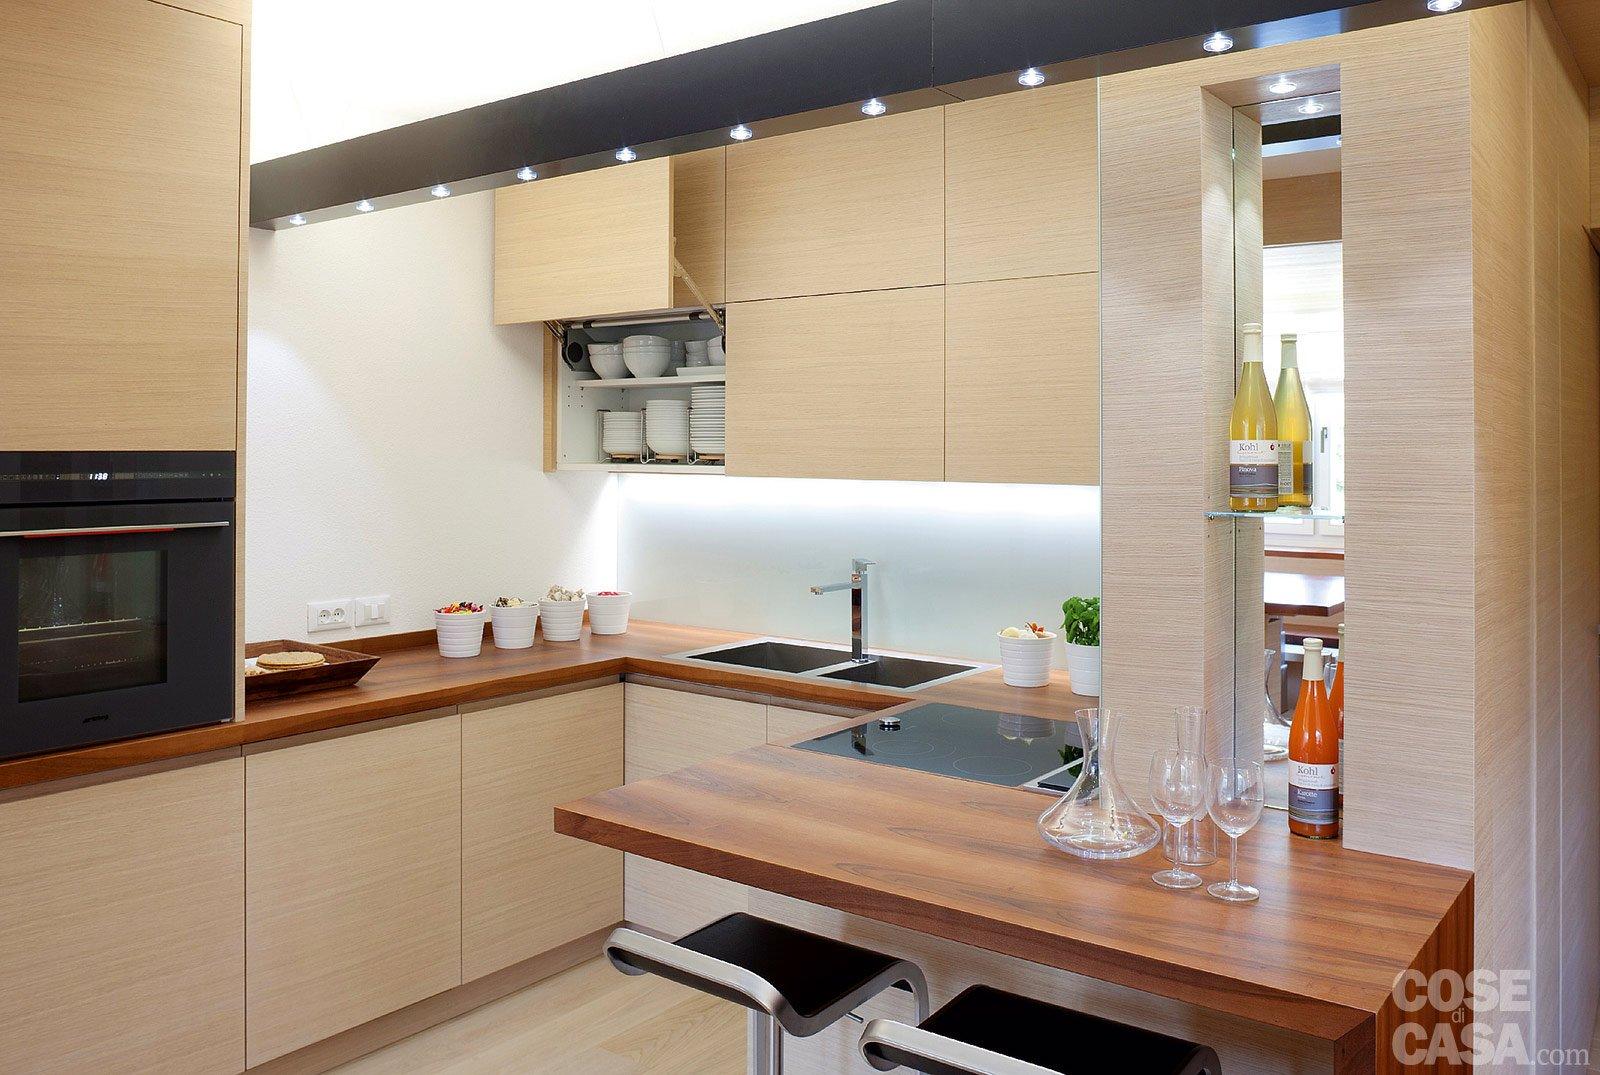 Cucine Moderne Ferro Di Cavallo : 57 Mq: Una Casa Con Stanze  #693F26 1600 1075 Piccole Cucine A Ferro Di Cavallo